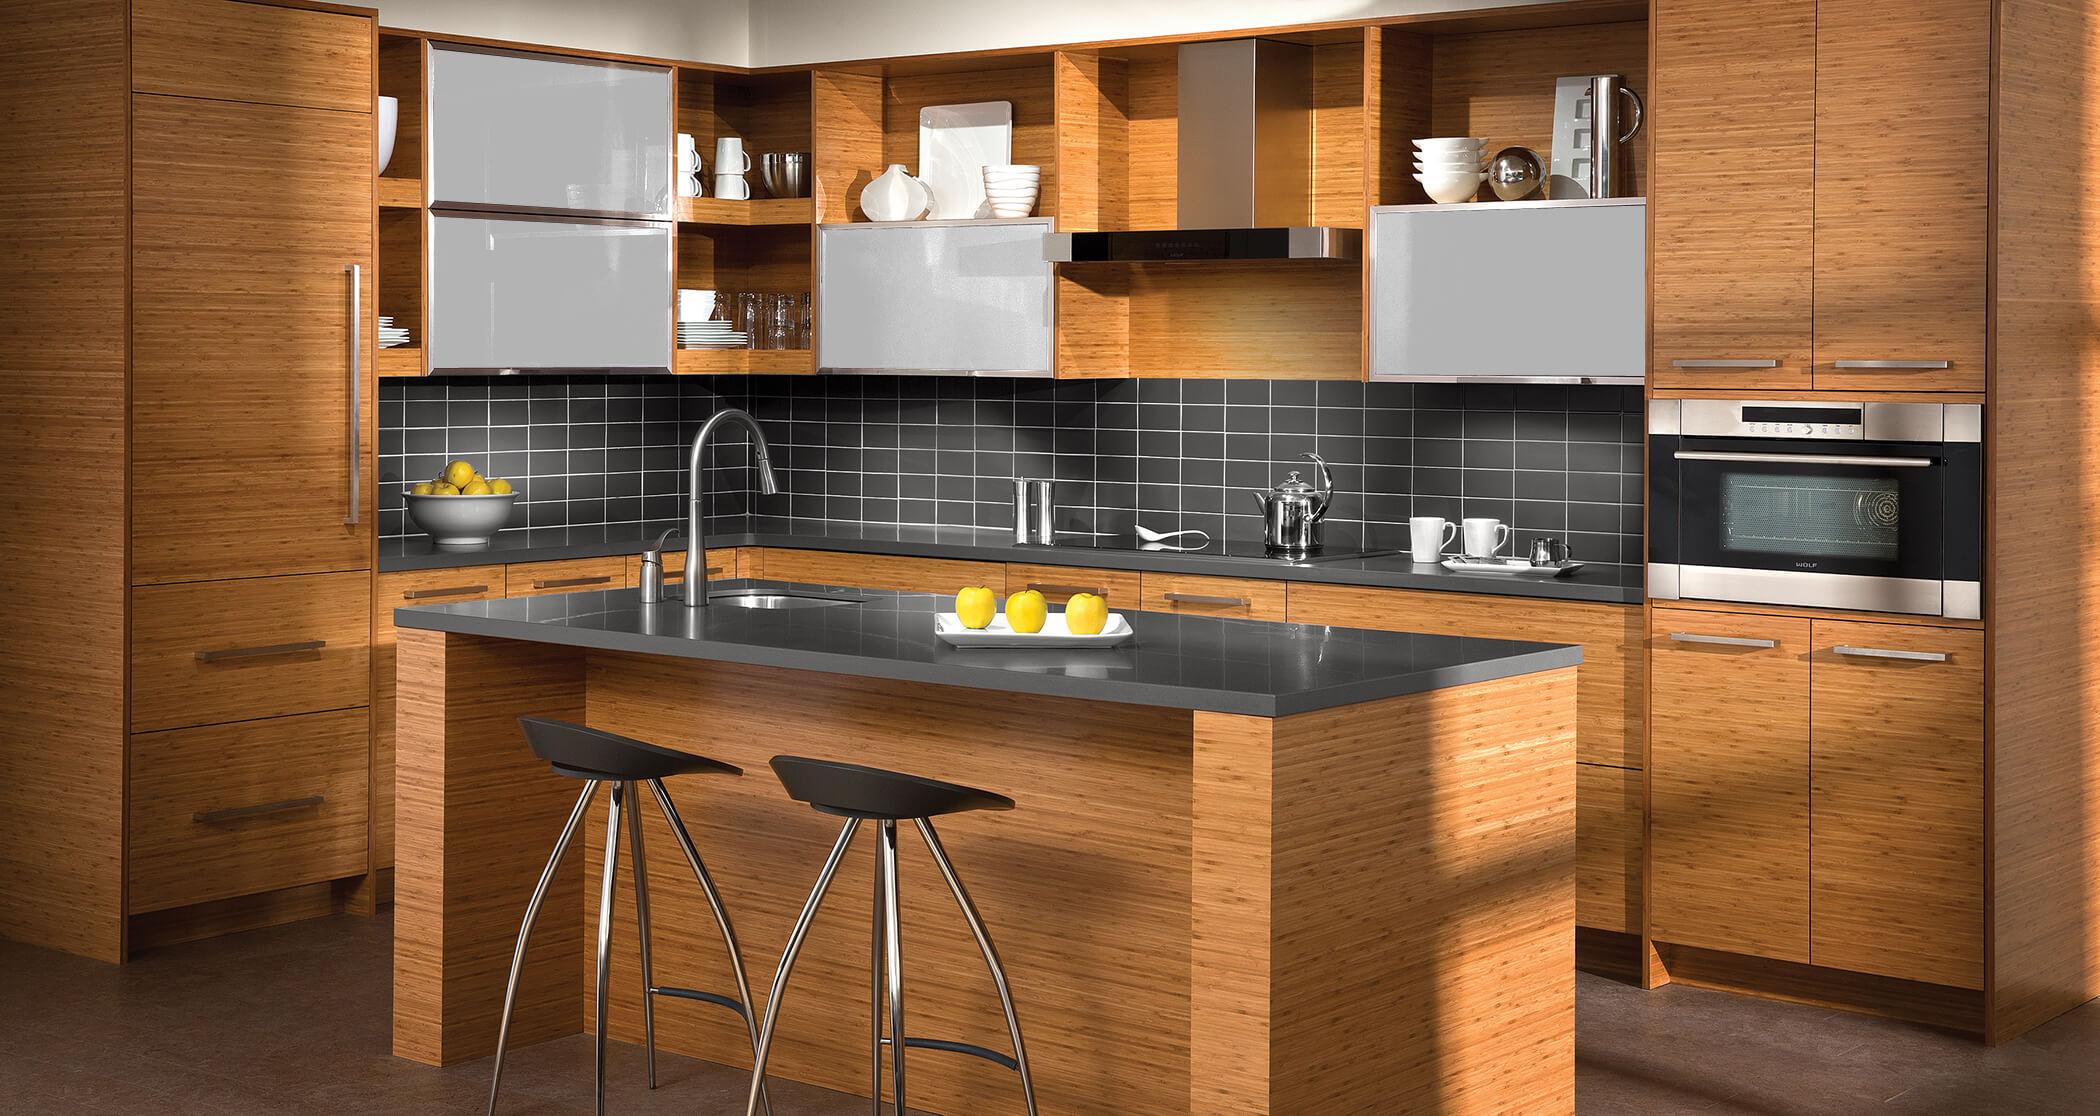 Trend Study Horizontal Grain Cabinets Make Kitchen Designs Modern Natural Dura Supreme Cabinetry